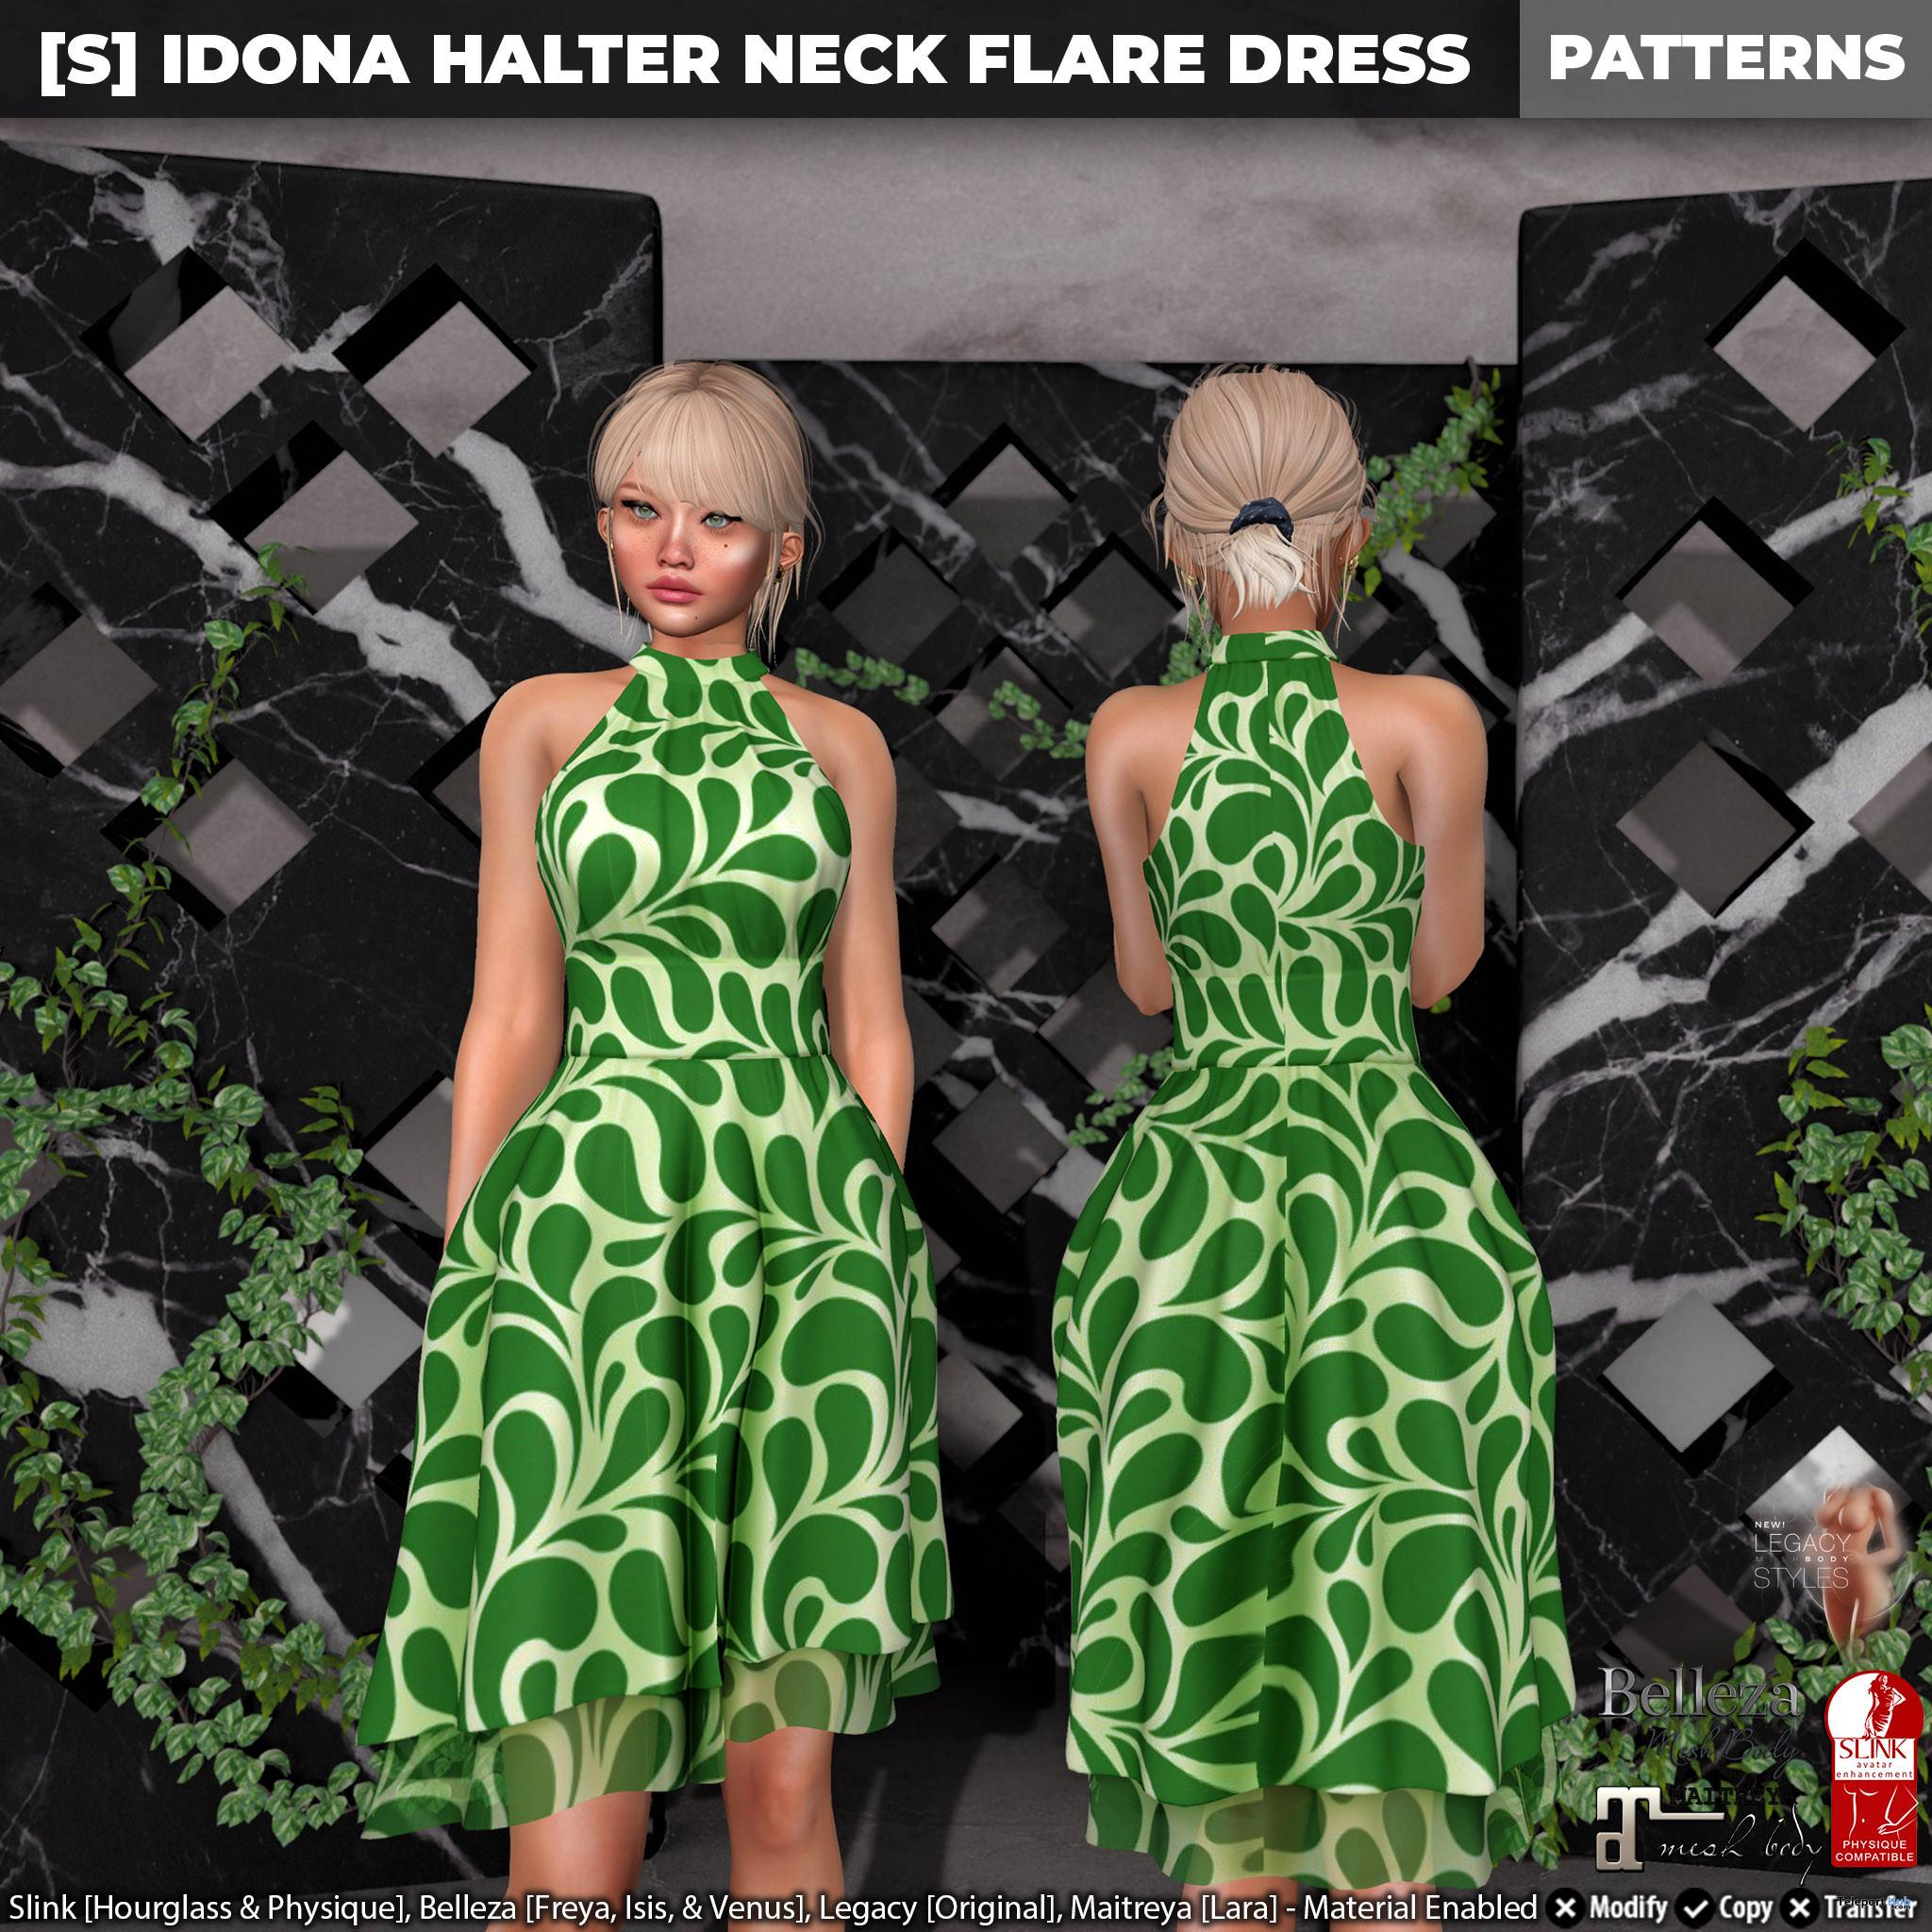 New Release: [S] Idona Halter Neck Flare Dress by [satus Inc] - Teleport Hub - teleporthub.com